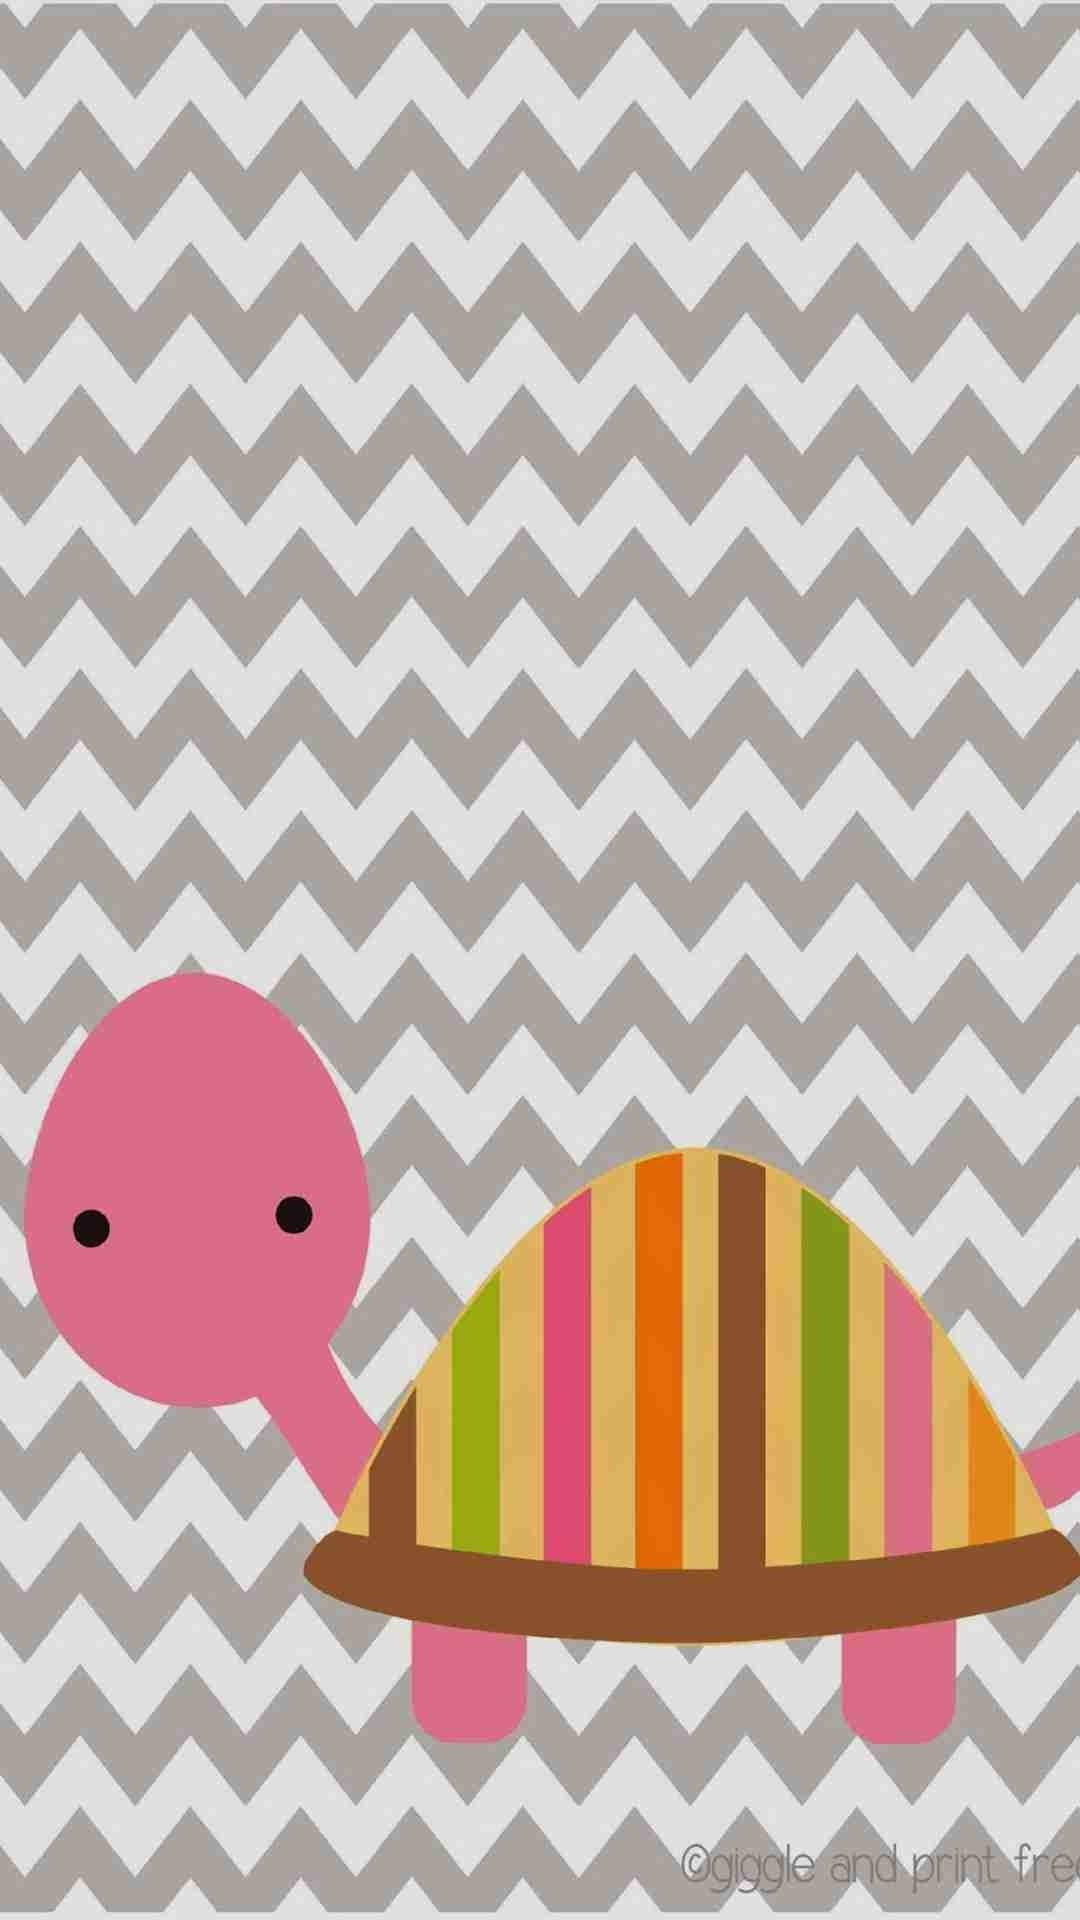 DIY Cute Pink Tortoise Pattern Chevron iPhone 6 Plus Wallpaper – Zigzag  Pattern #iPhone #